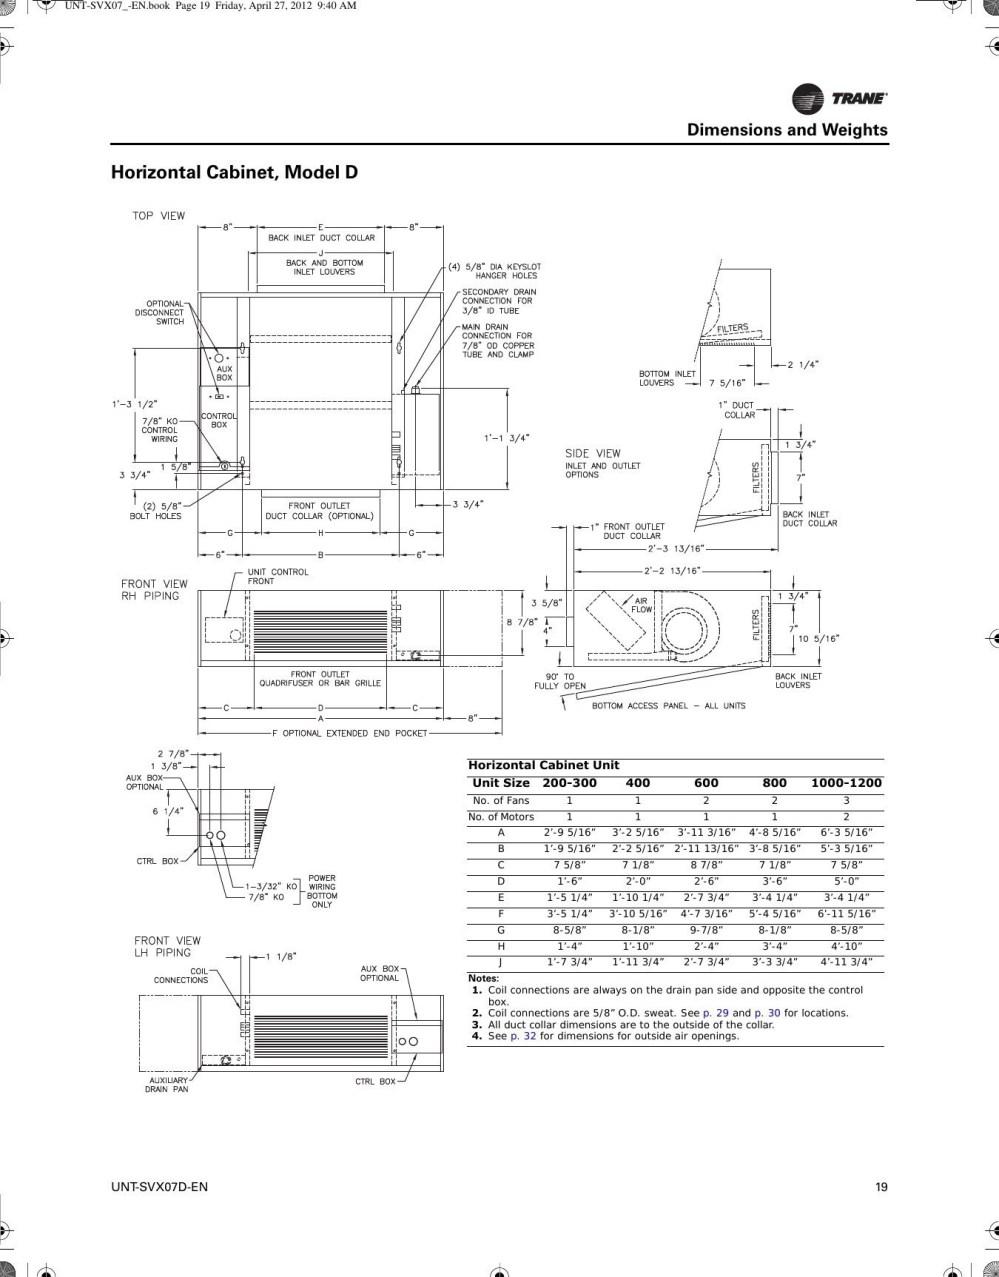 medium resolution of pollak 12 705 blade wiring diagram wiring library rh 8 boptions1 de 7 pin trailer connector pinout 7 pin trailer connector pinout